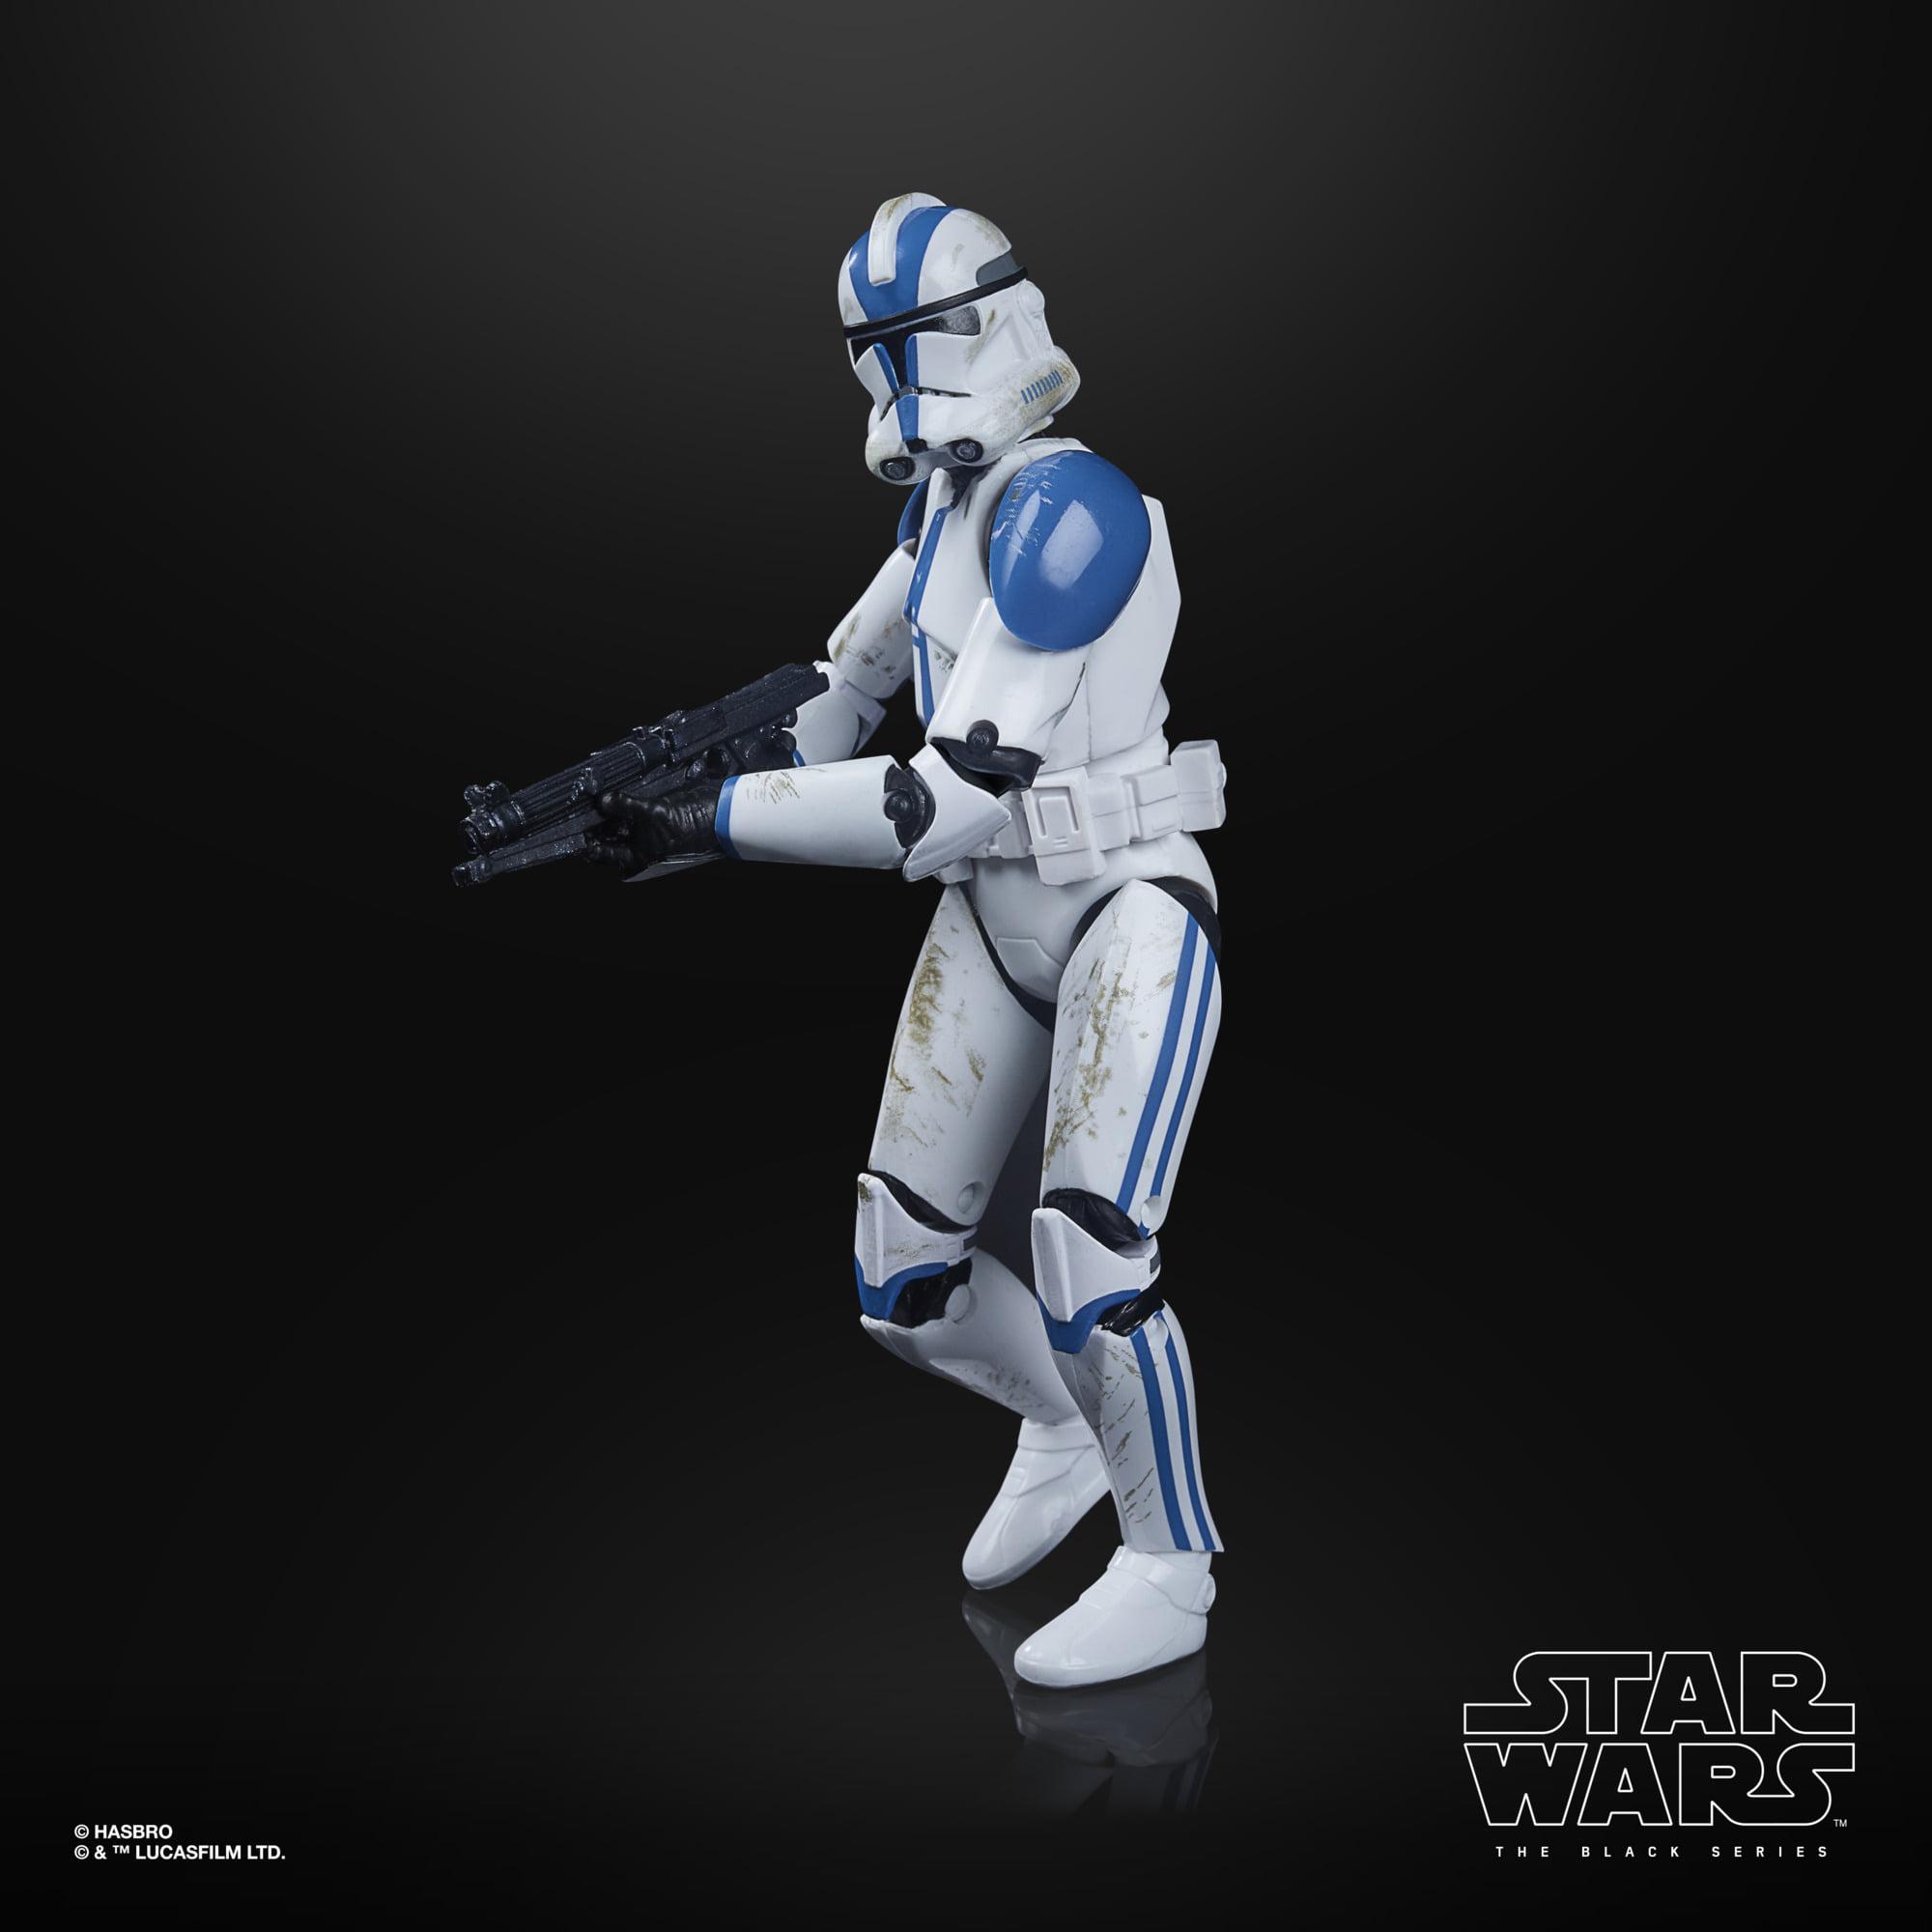 Black-Series-501st-Legion-Clone-Trooper-ROTS-Archive-Loose-4.jpg